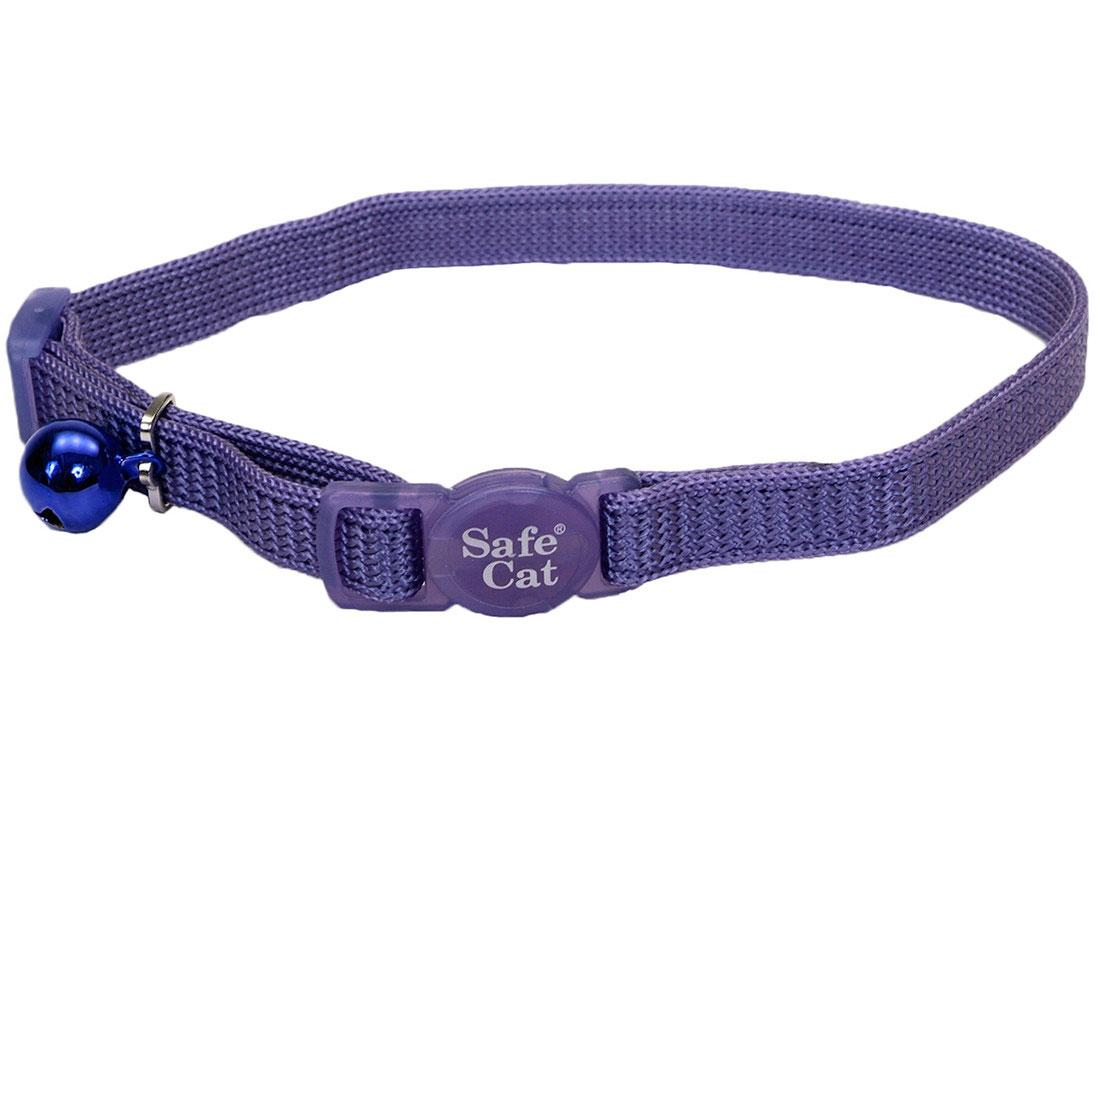 Safe Cat Adjustable Snag-Proof Breakaway Cat Collar, Paradise Purple, 3/8-in x 8-12-in